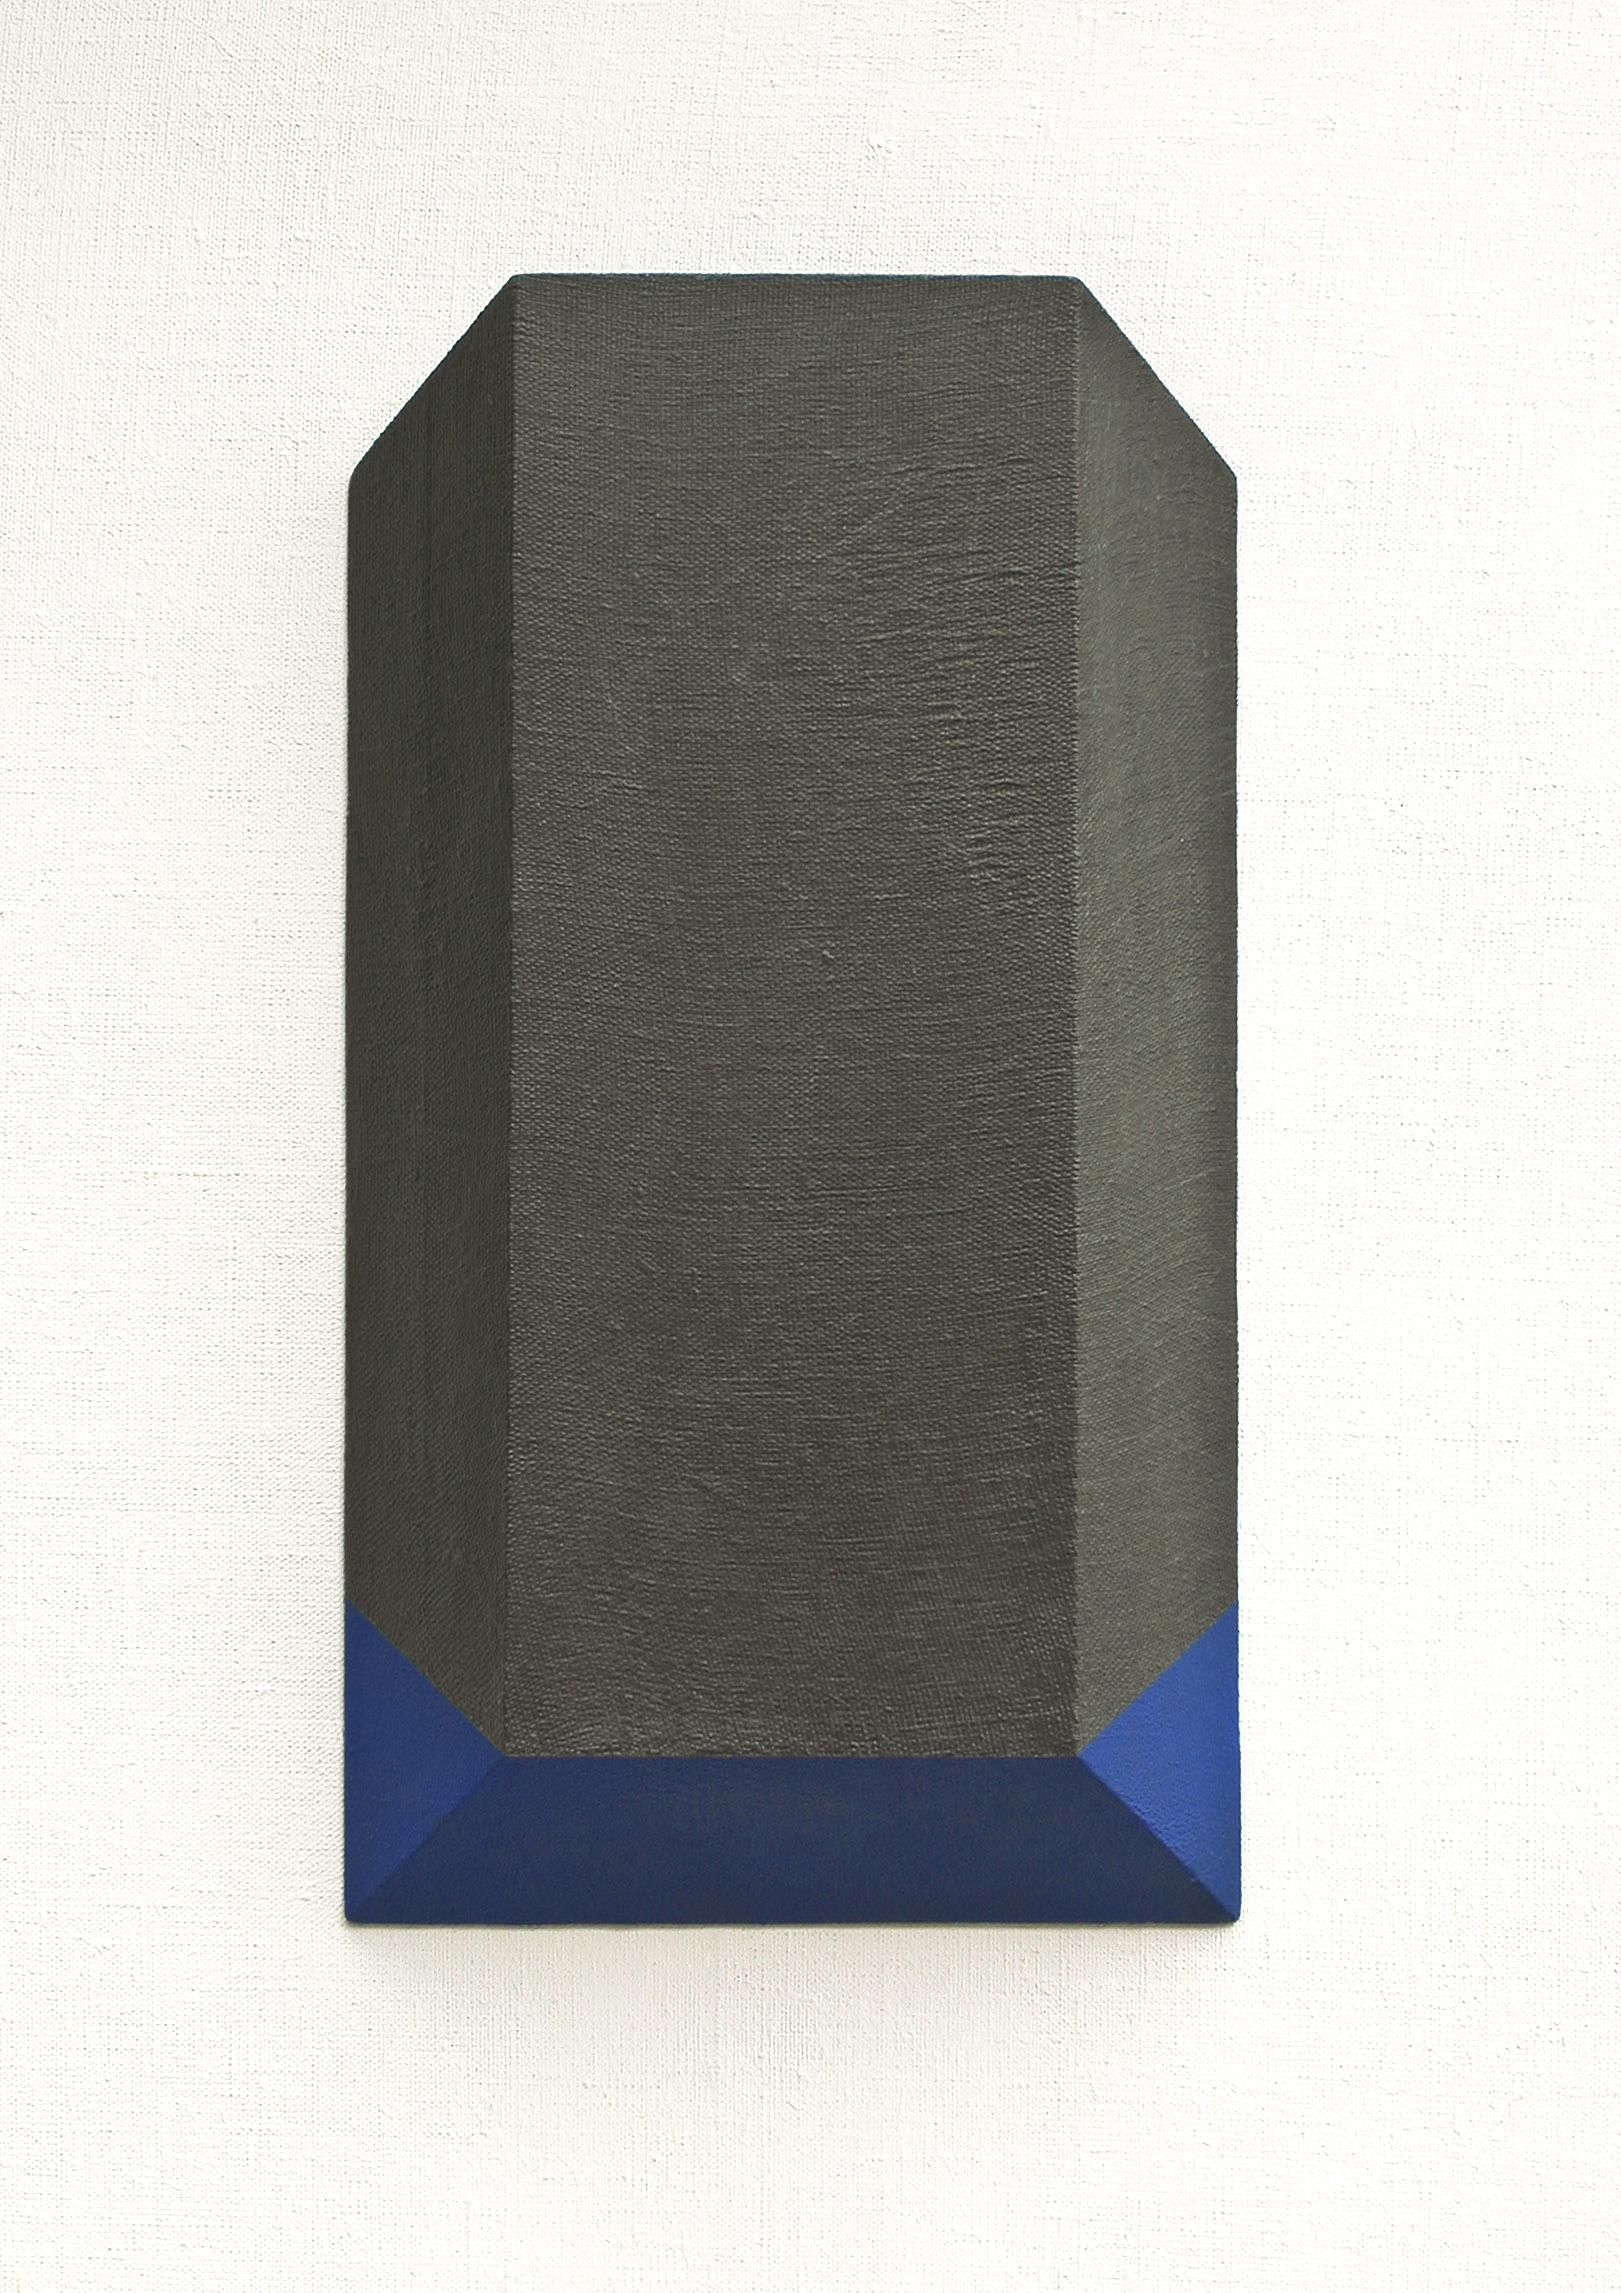 grafit, akril, les, 40 x 22 cm, 1998